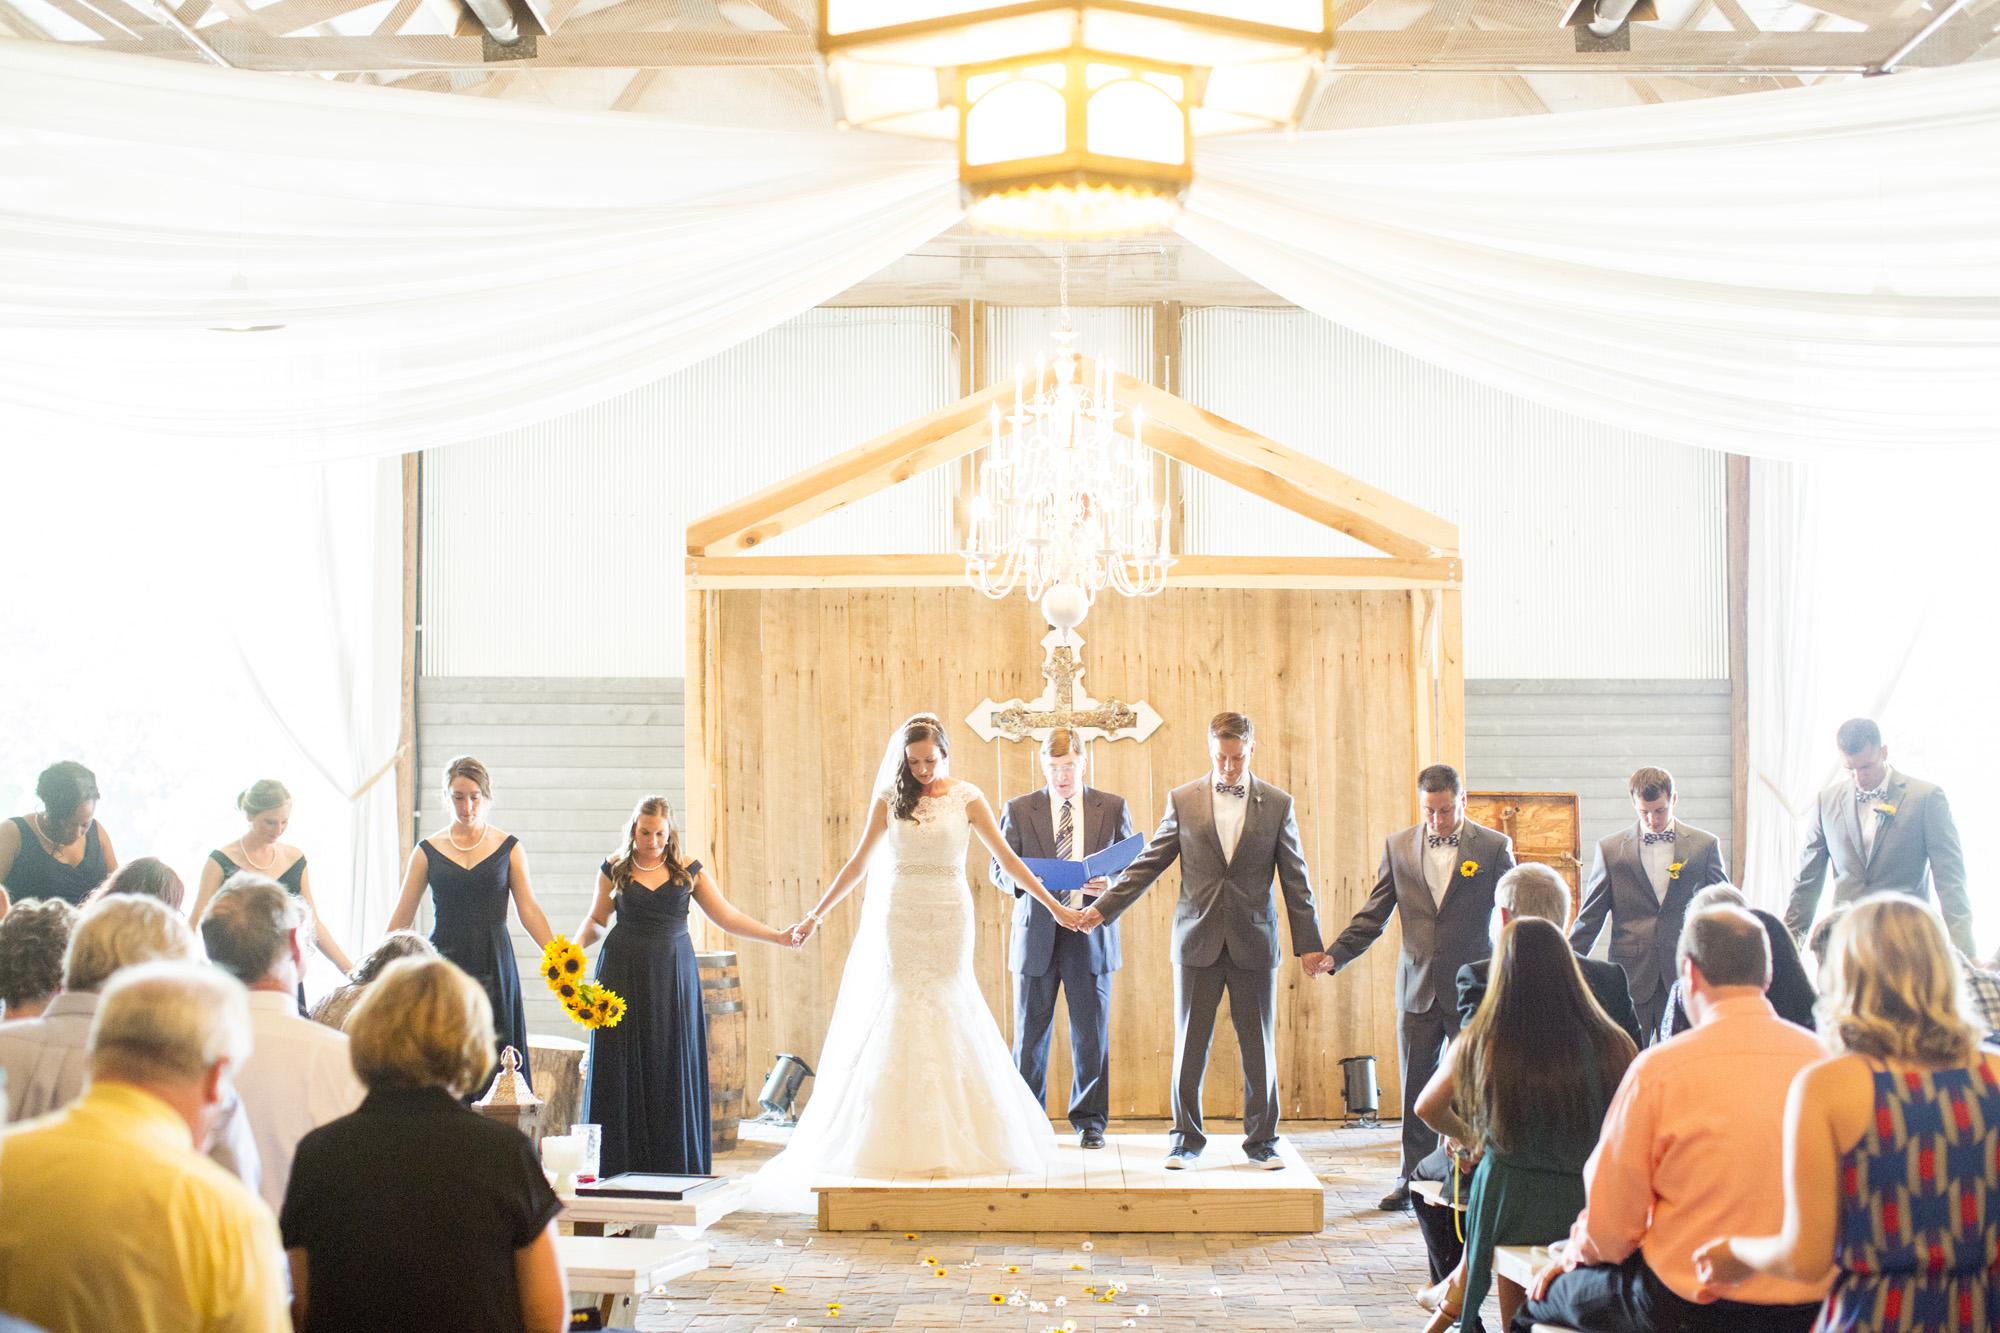 Seriously_Sabrina_Photography_Bowling_Green_Kentucky_Highland_Stables_Wedding_Wolff112.jpg